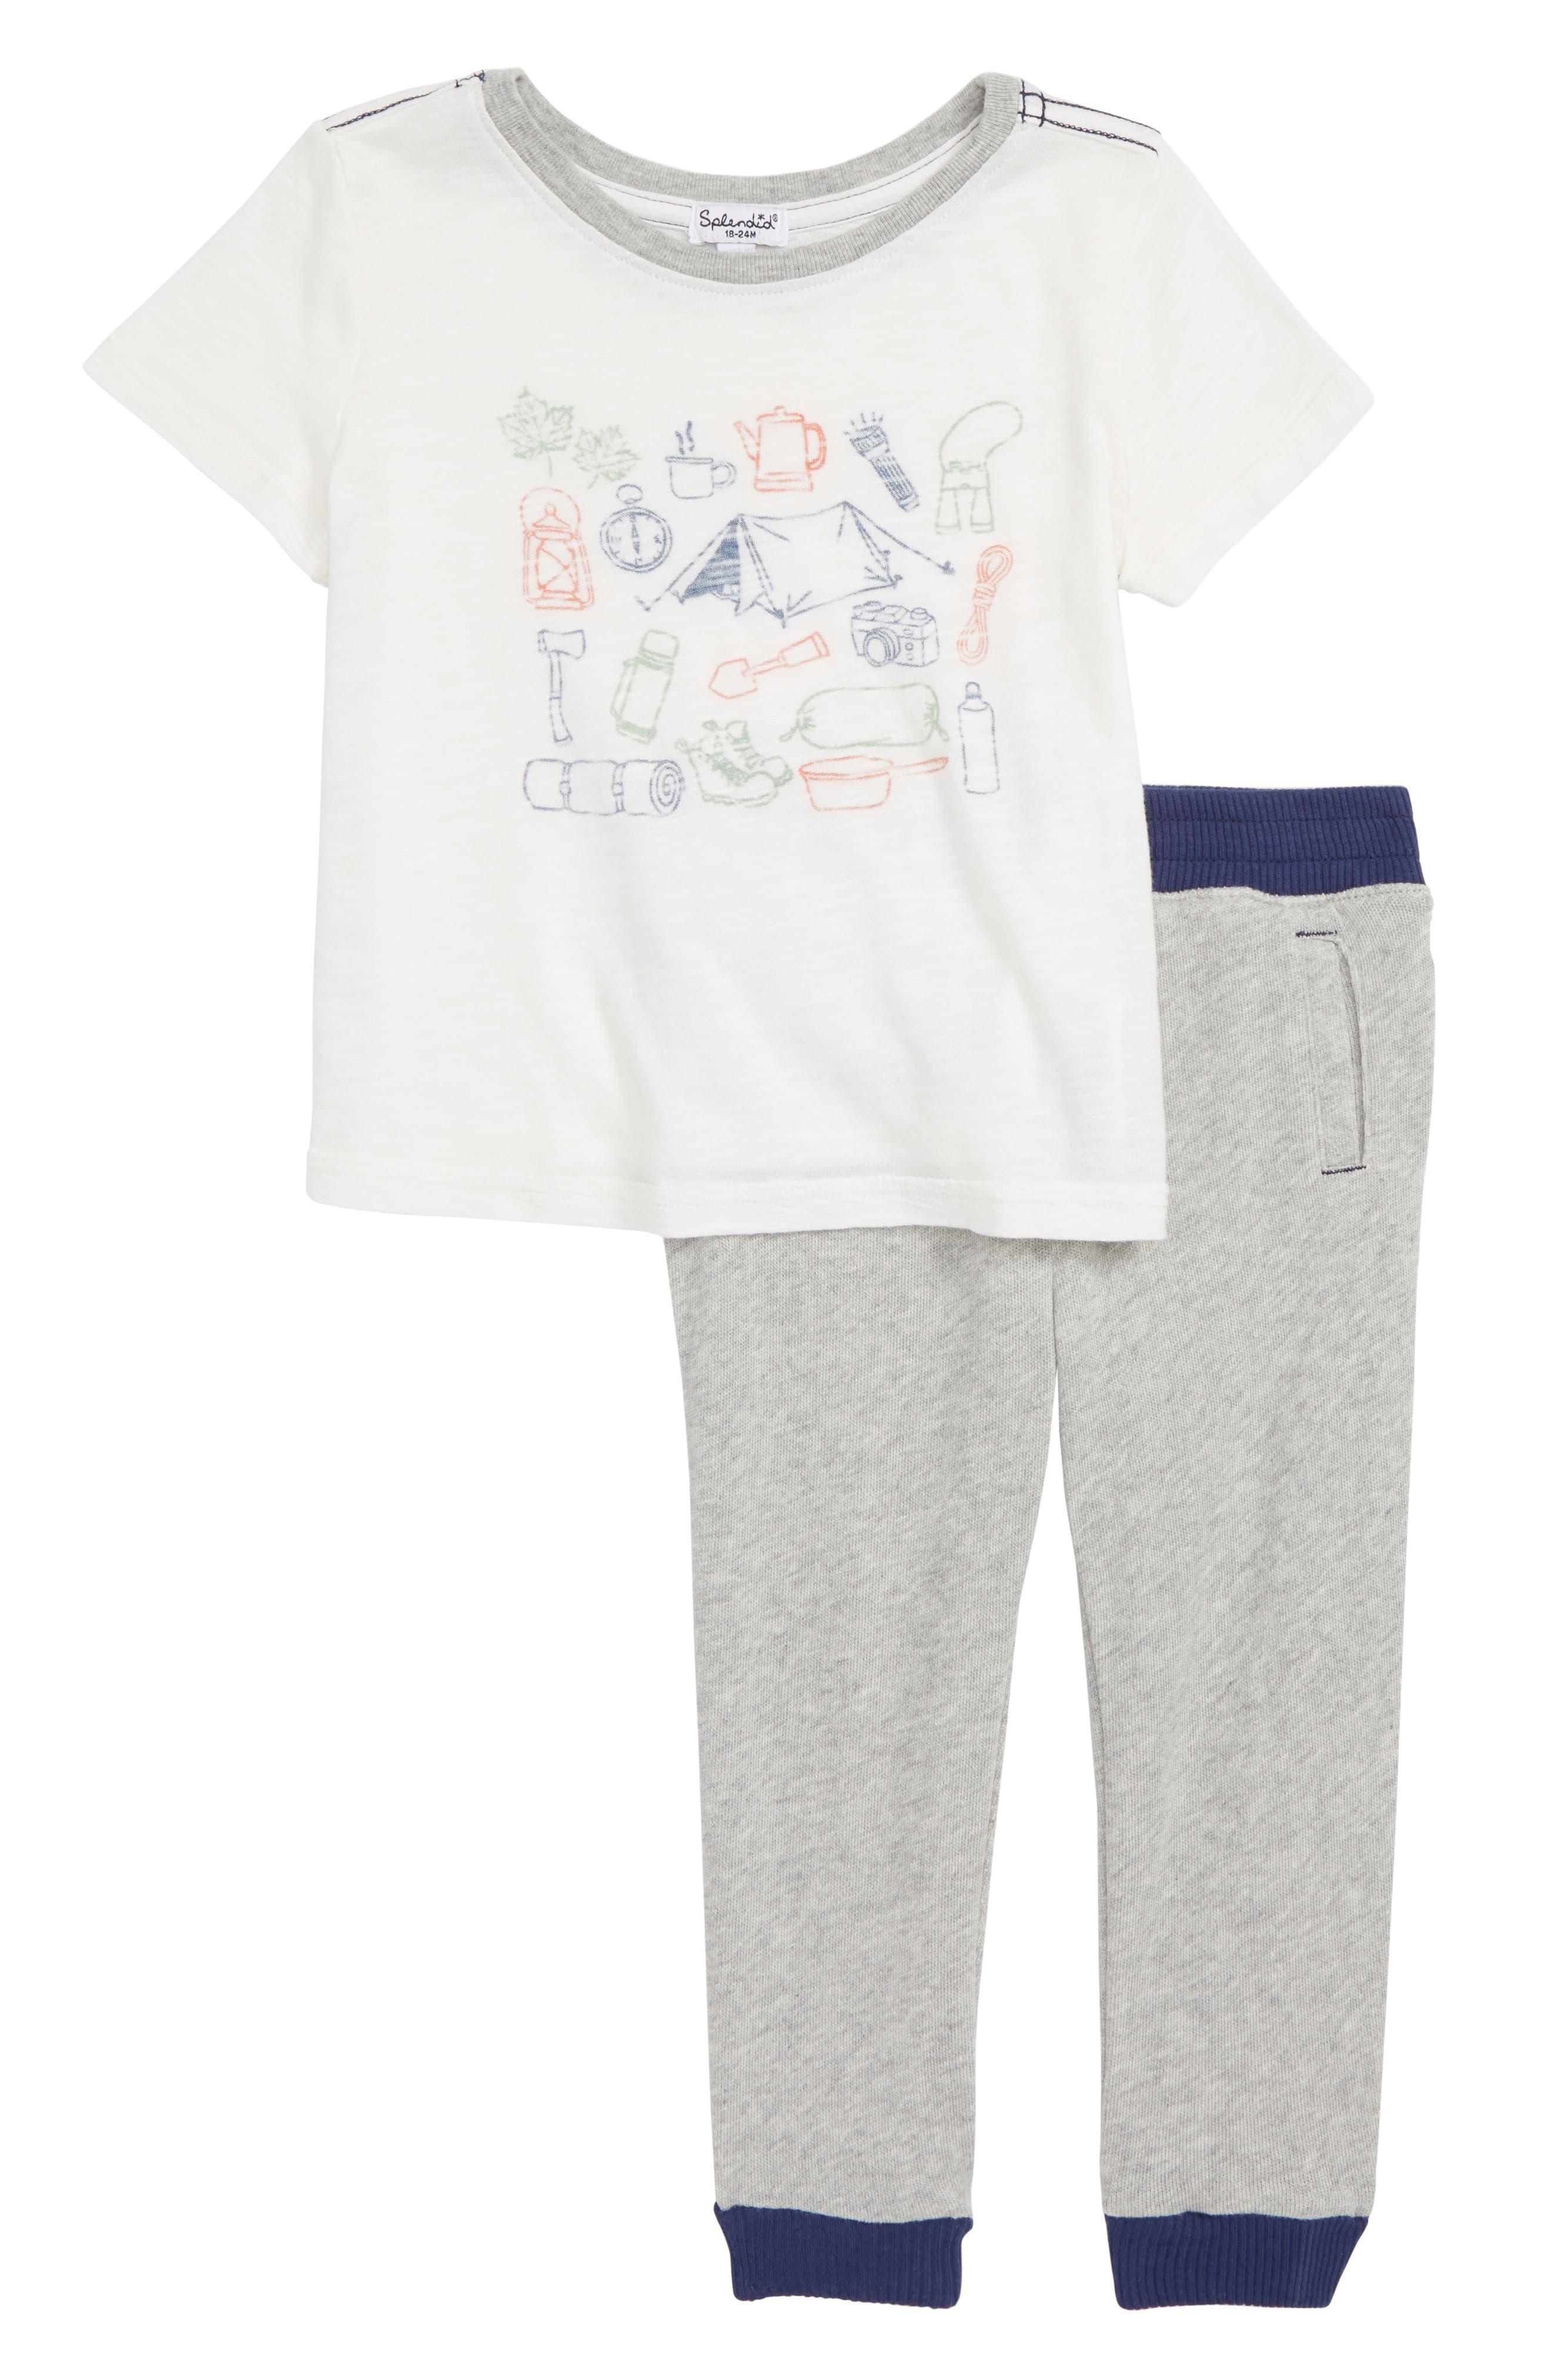 Splendid Baby Clothing | Nordstrom